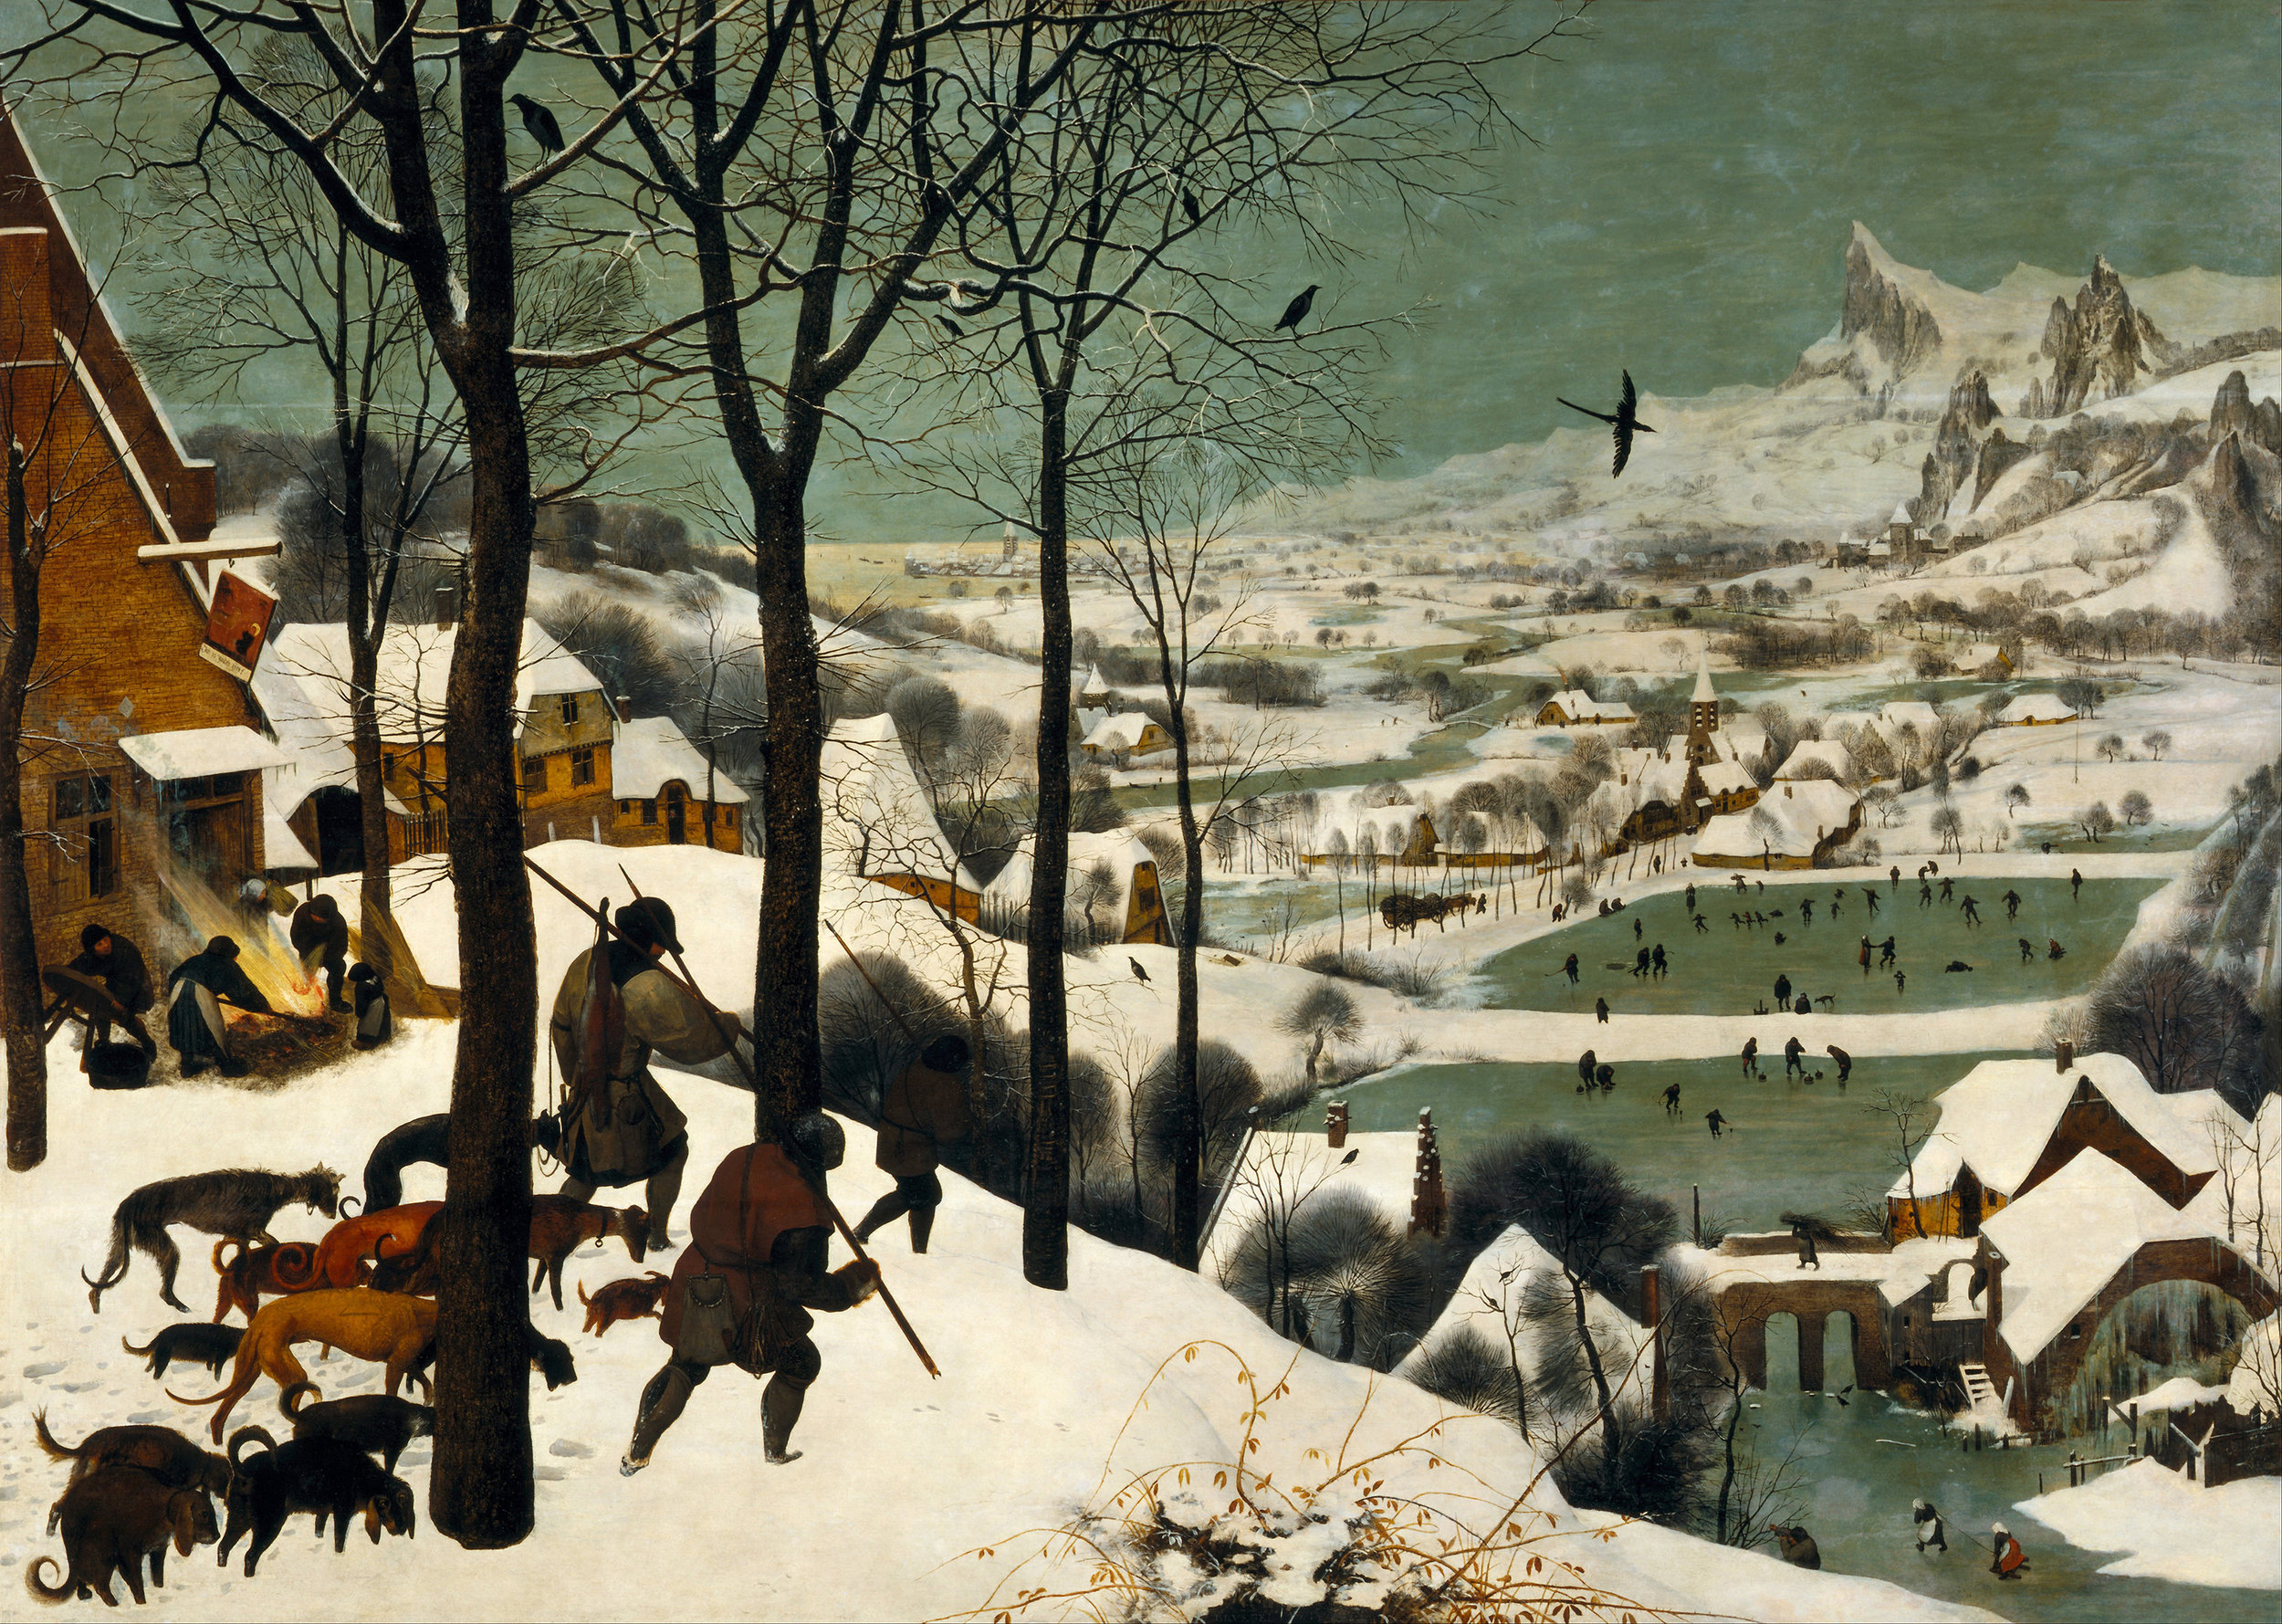 pieter_bruegel_the_elder_-_hunters_in_the_snow_winter_1565_oil_on_wood_117x162cm_kunsthistorisches_museum_small.jpg